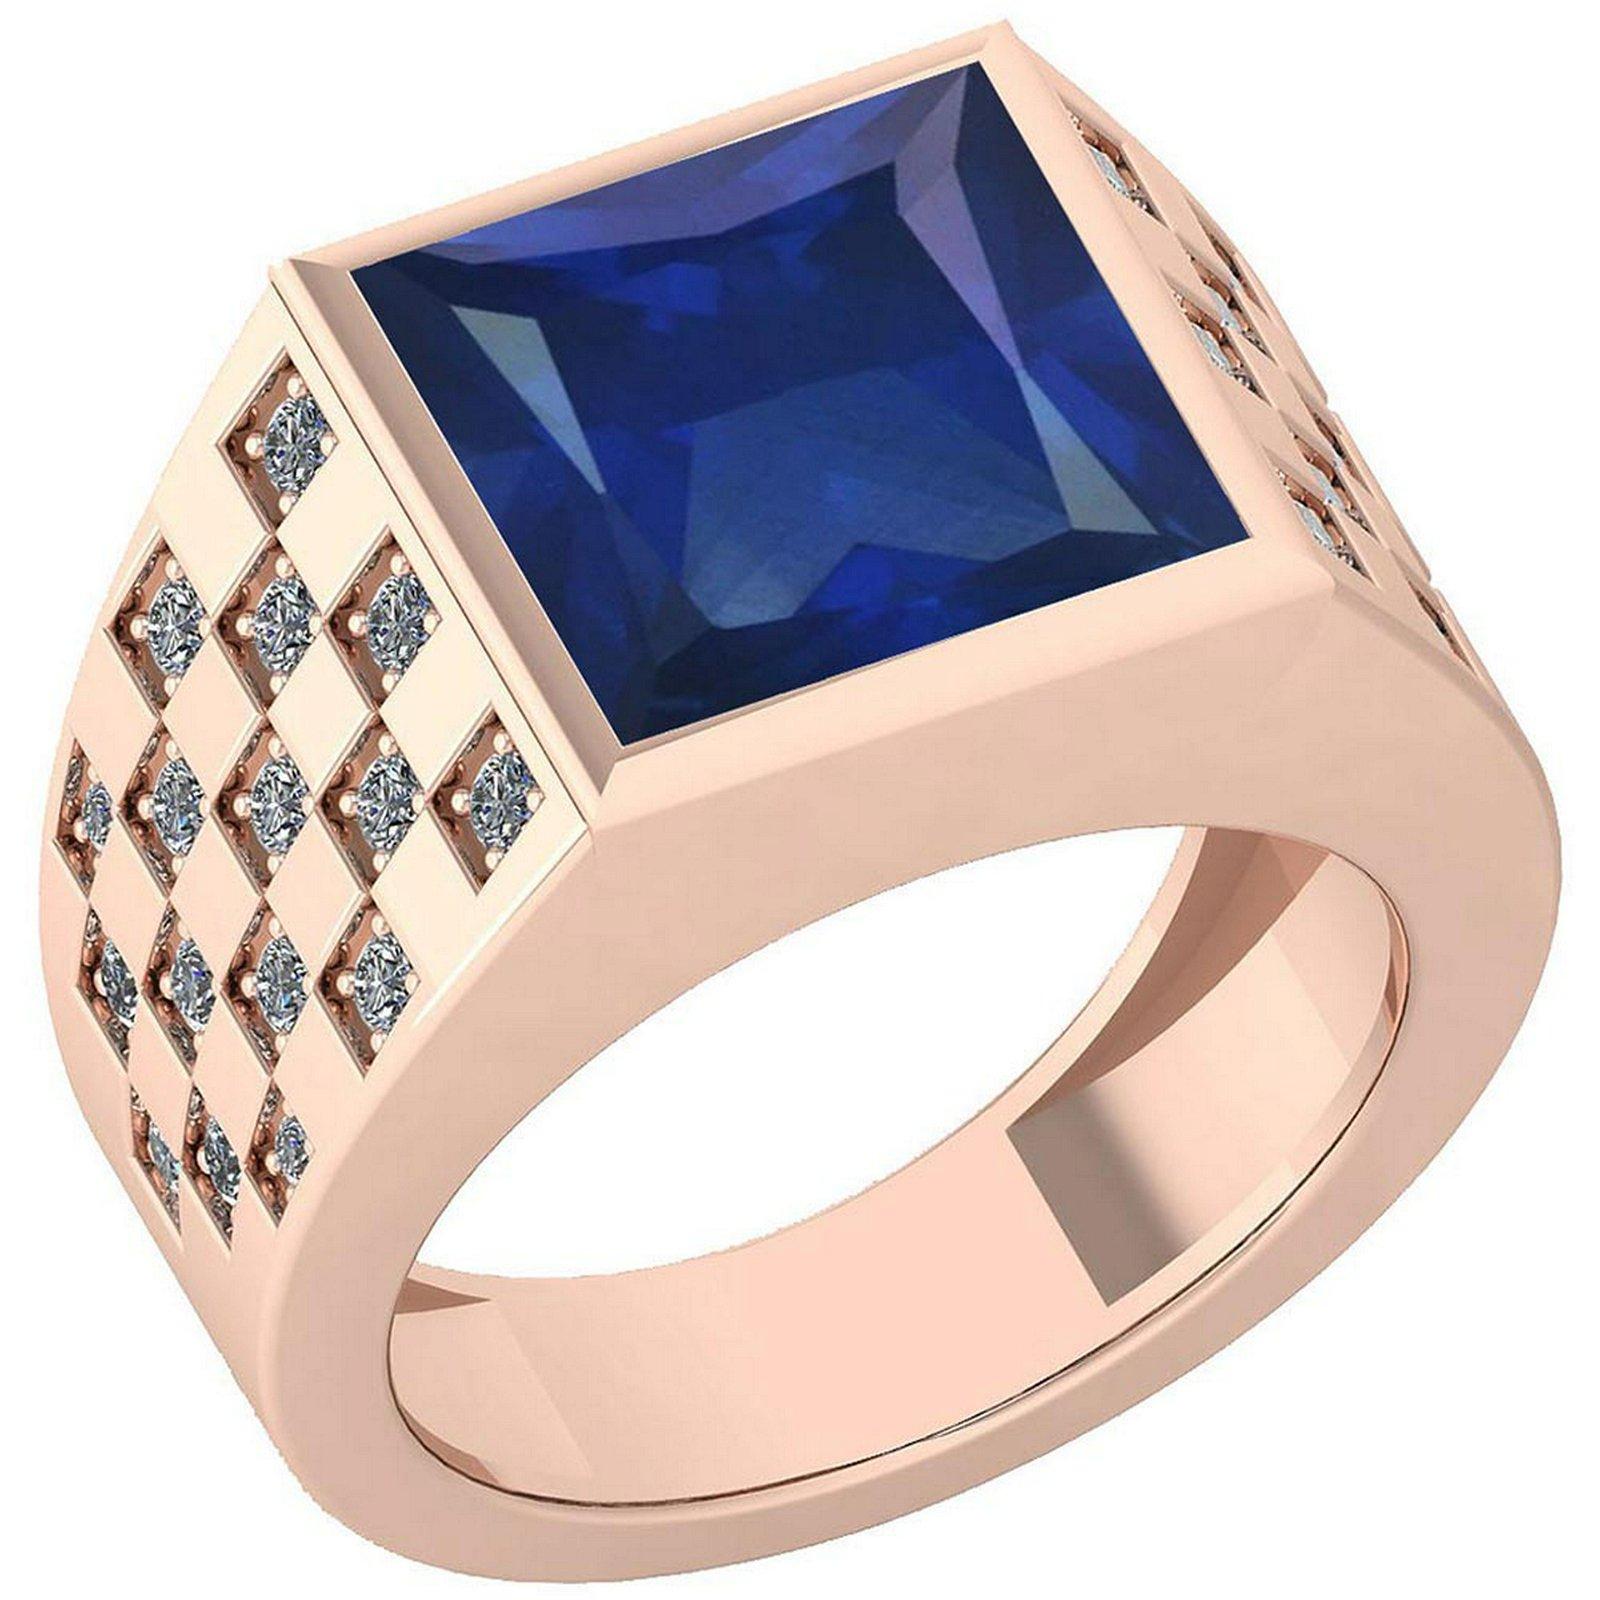 Certified 6.02 Ctw Blue Sapphire And Diamond VS/SI1 14K